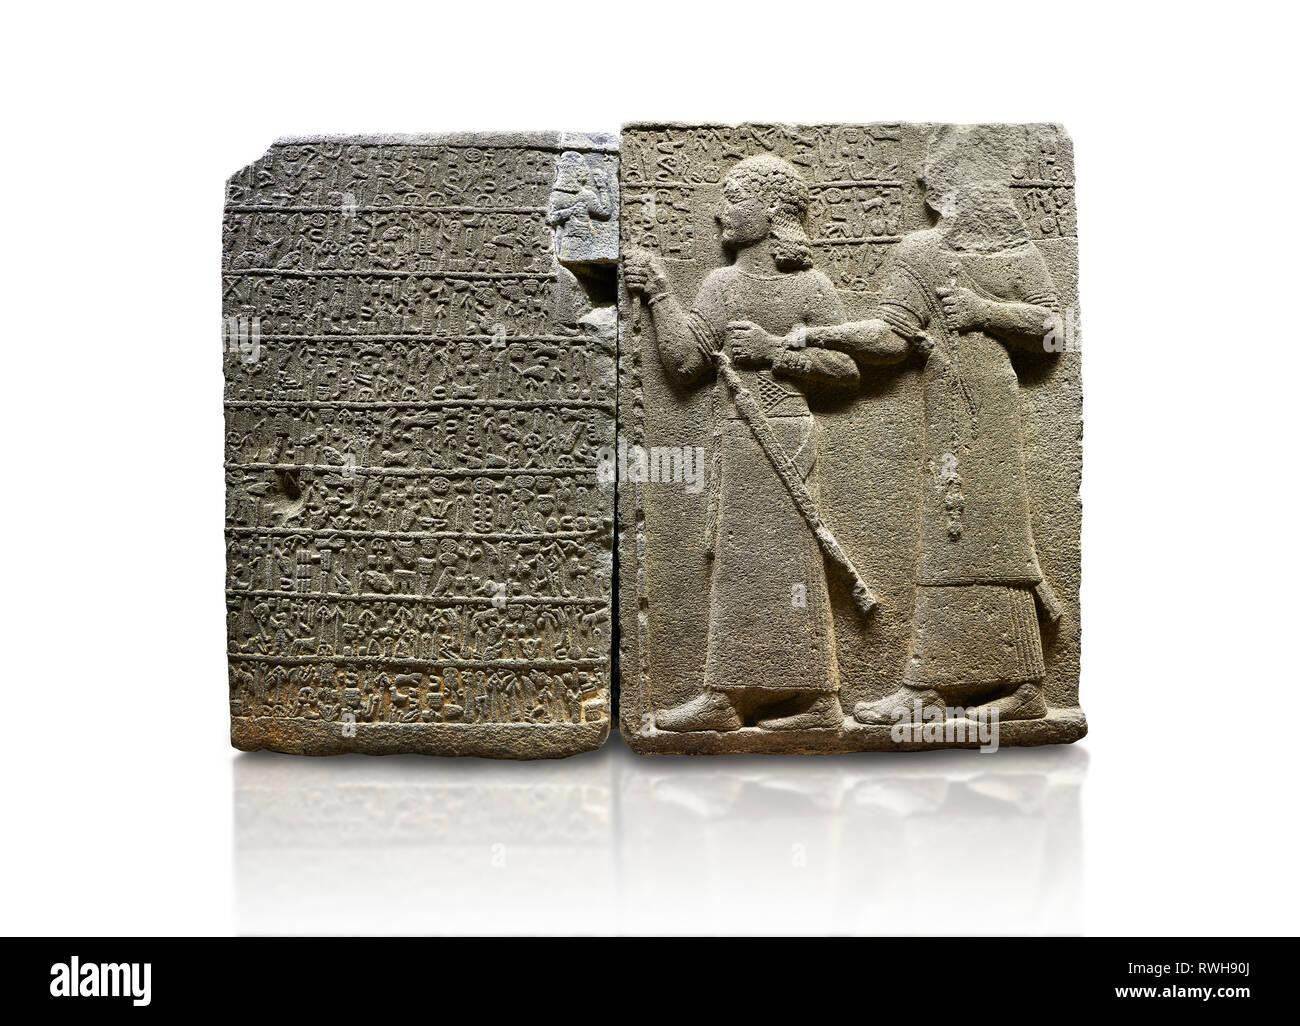 Hittite monumental relief sculpted orthostat stone panel of Royal Buttress. Basalt, Karkamıs, (Kargamıs), Carchemish (Karkemish), 900-700 B.C. Anatoli Stock Photo